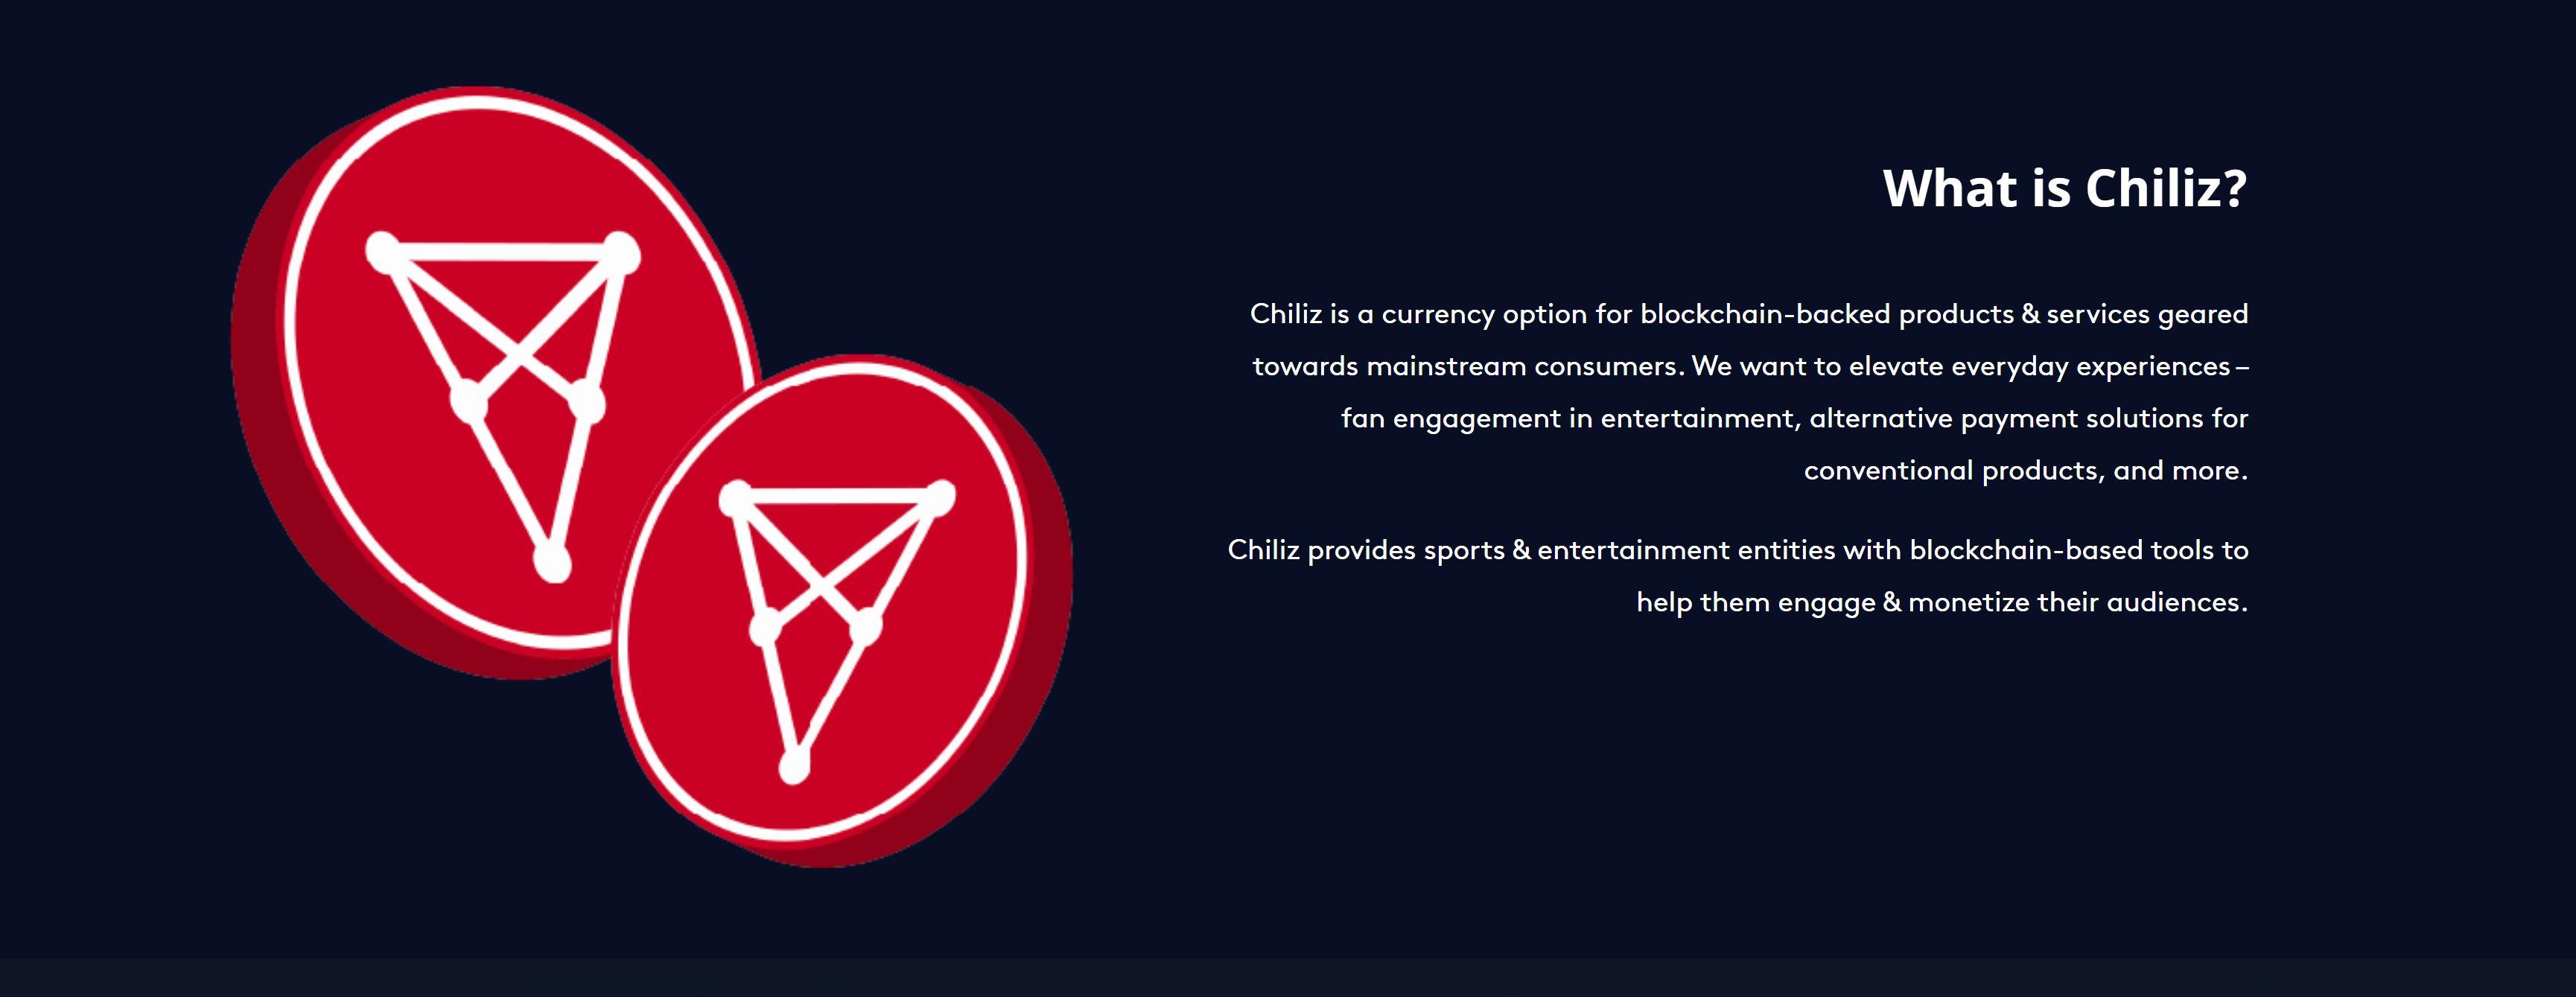 Chiliz crypto project explained